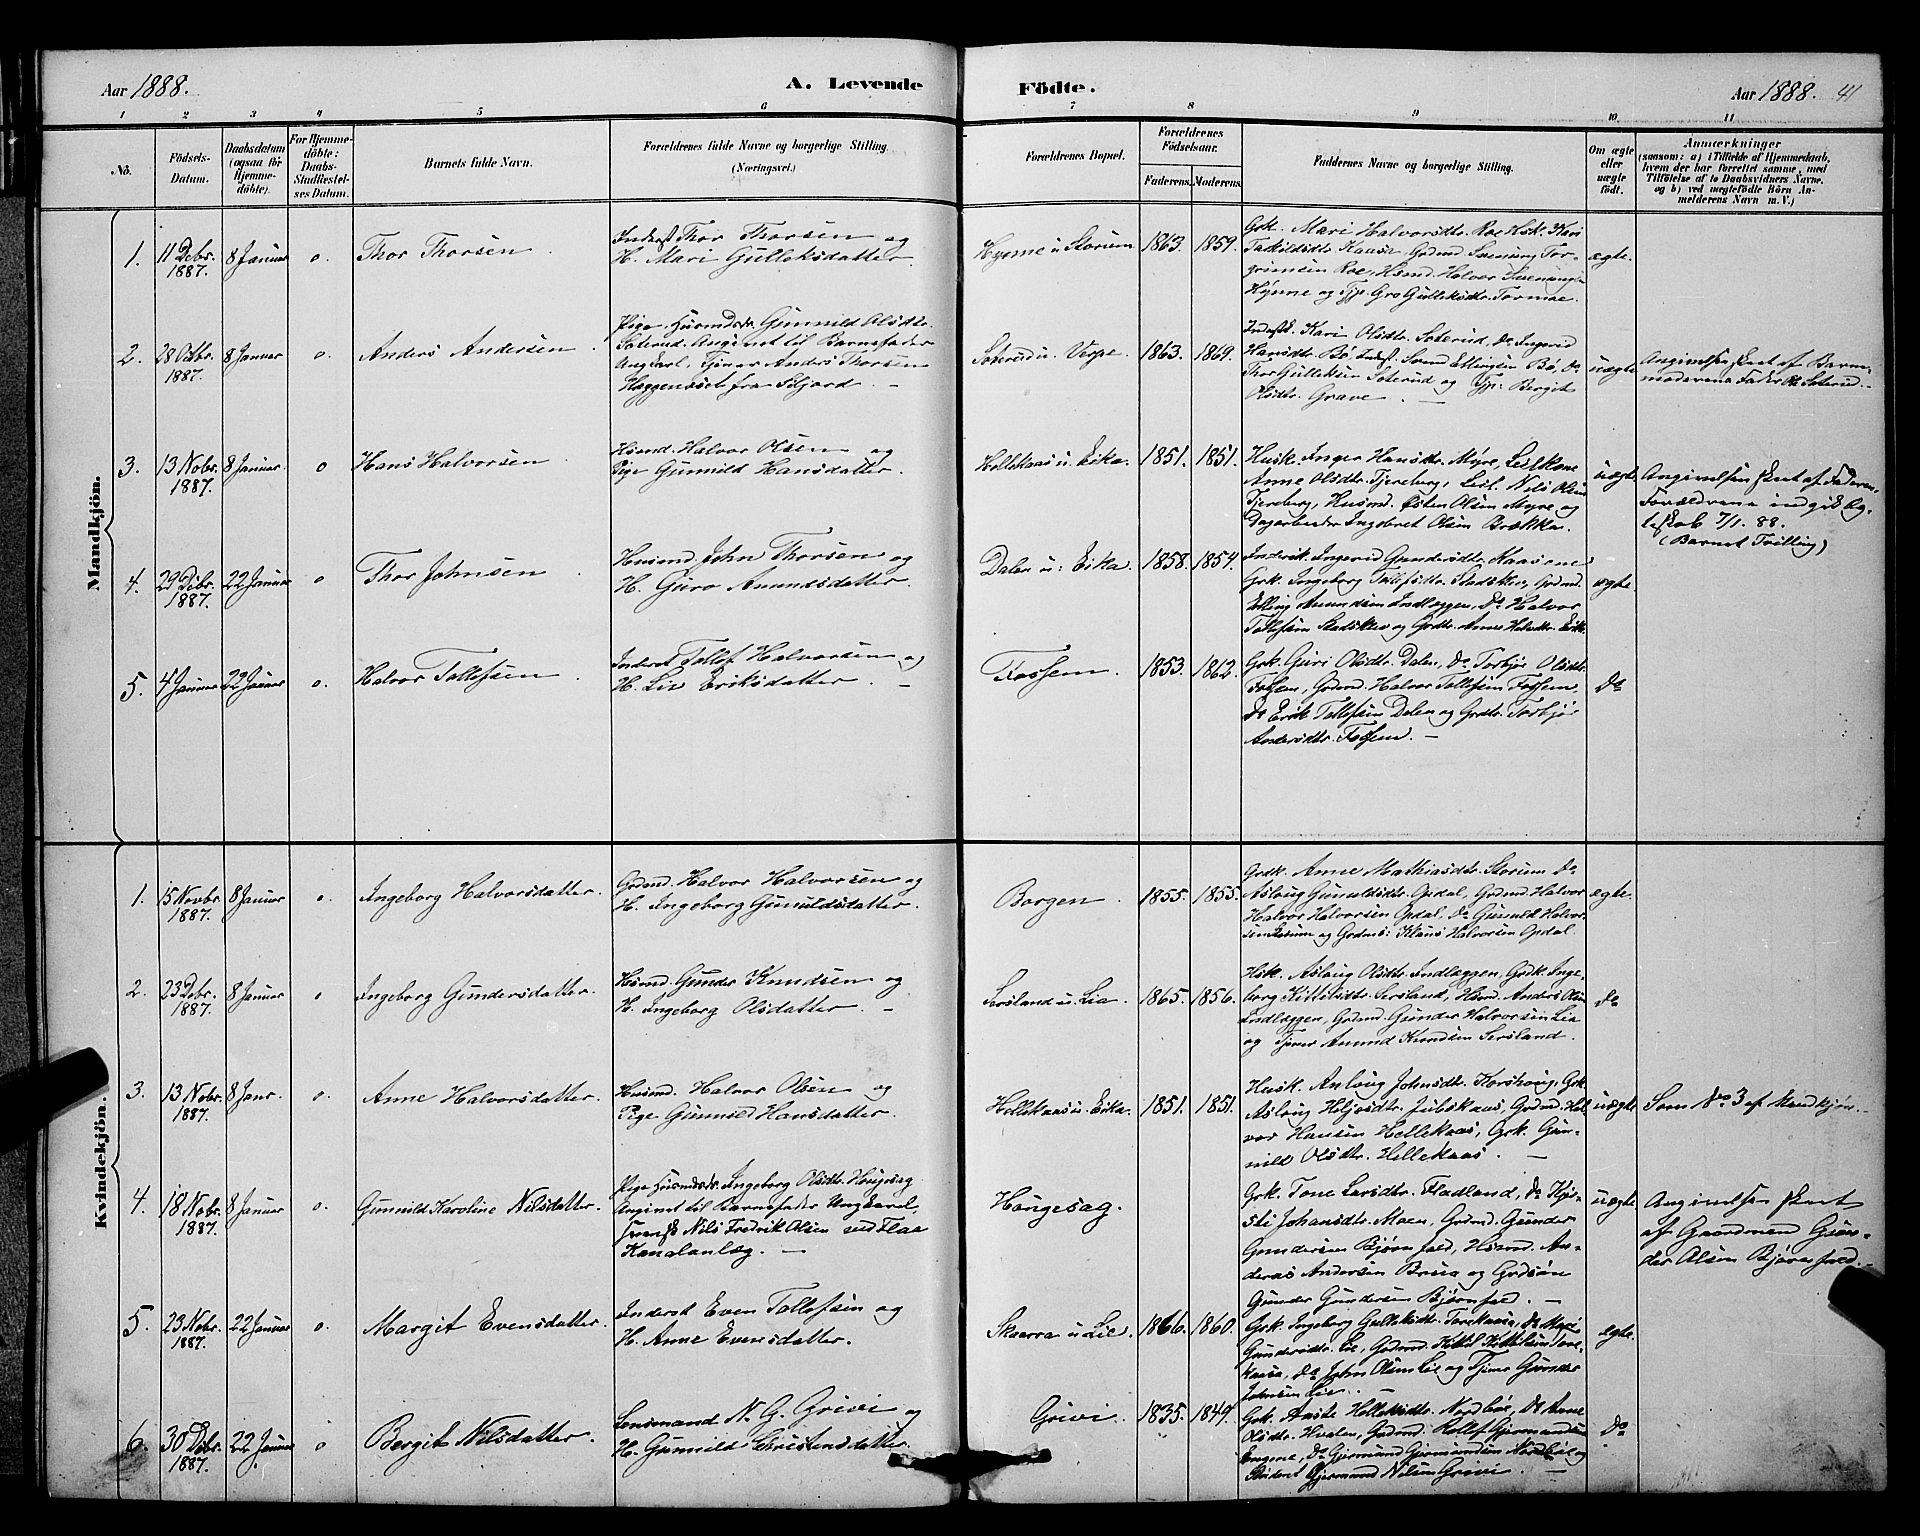 SAKO, Bø kirkebøker, G/Ga/L0005: Klokkerbok nr. 5, 1883-1897, s. 41